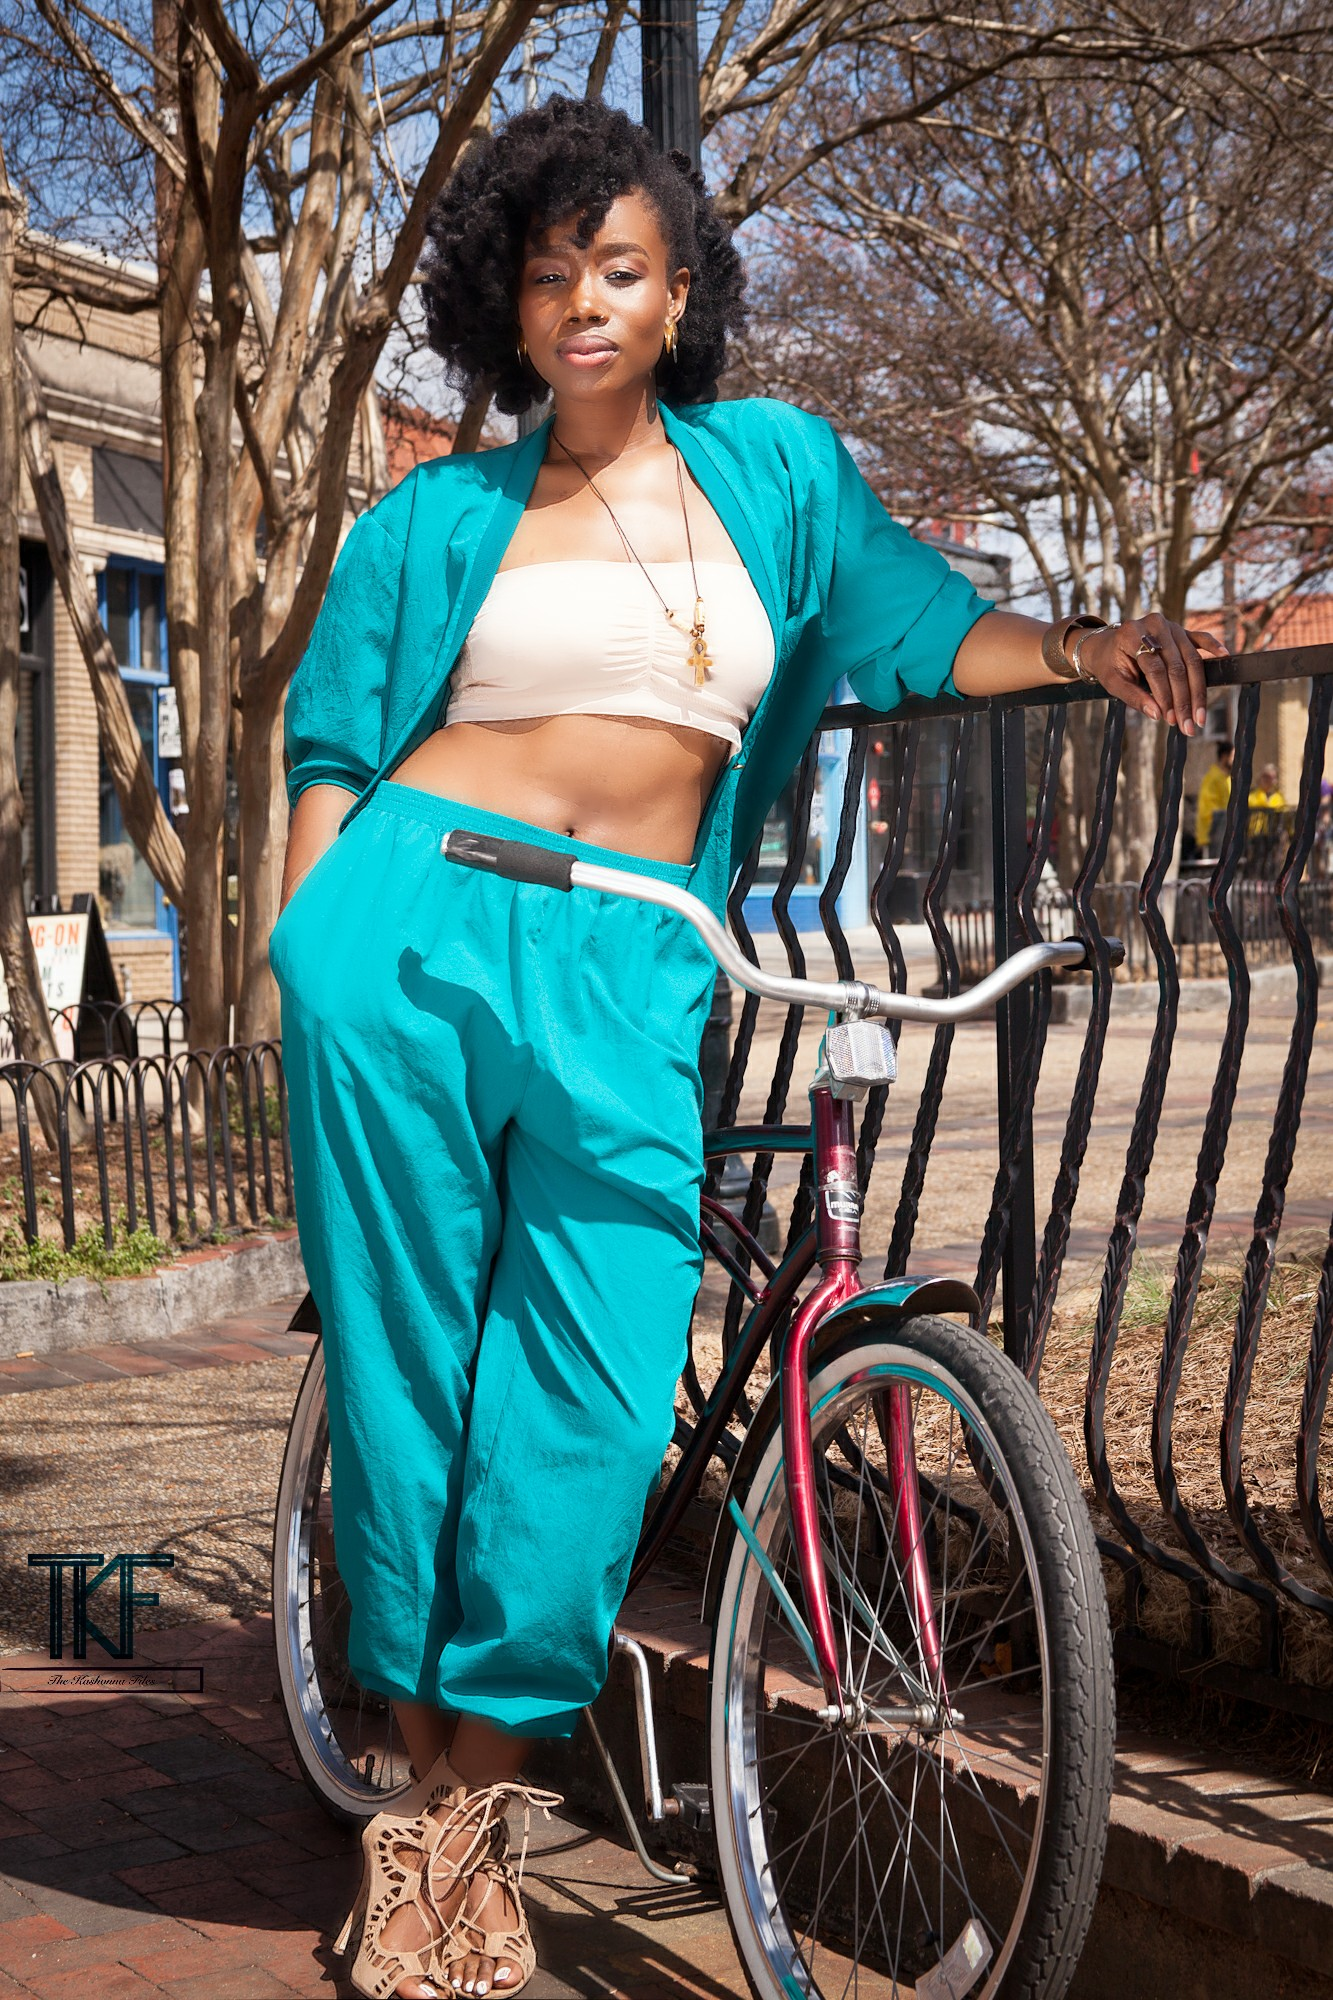 photo-shoot-with-vintage-bike.jpg